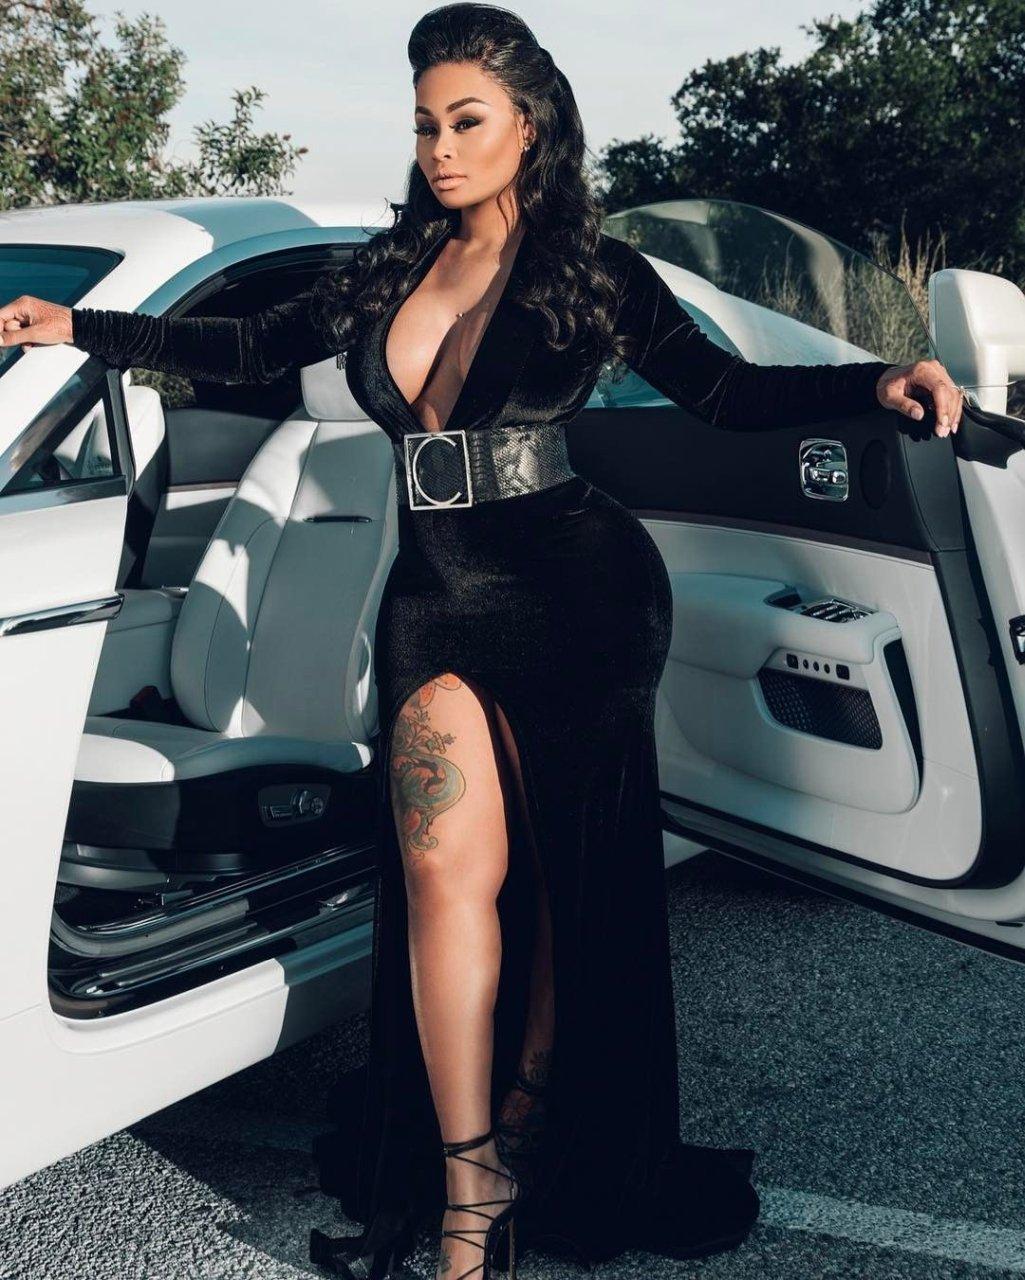 Blac Chyna Sexy - 7 Photos - 2019 year